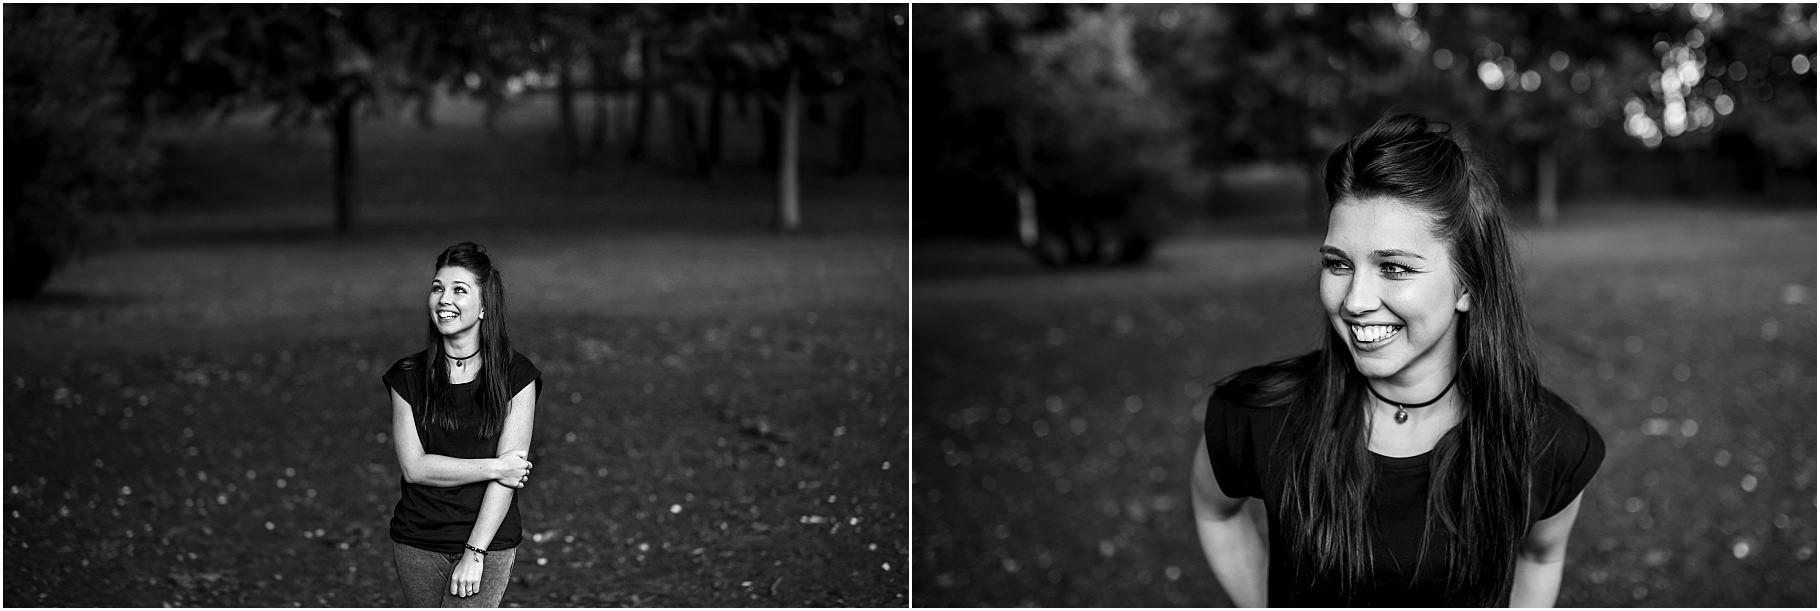 stanley-park-portraits-28.jpg